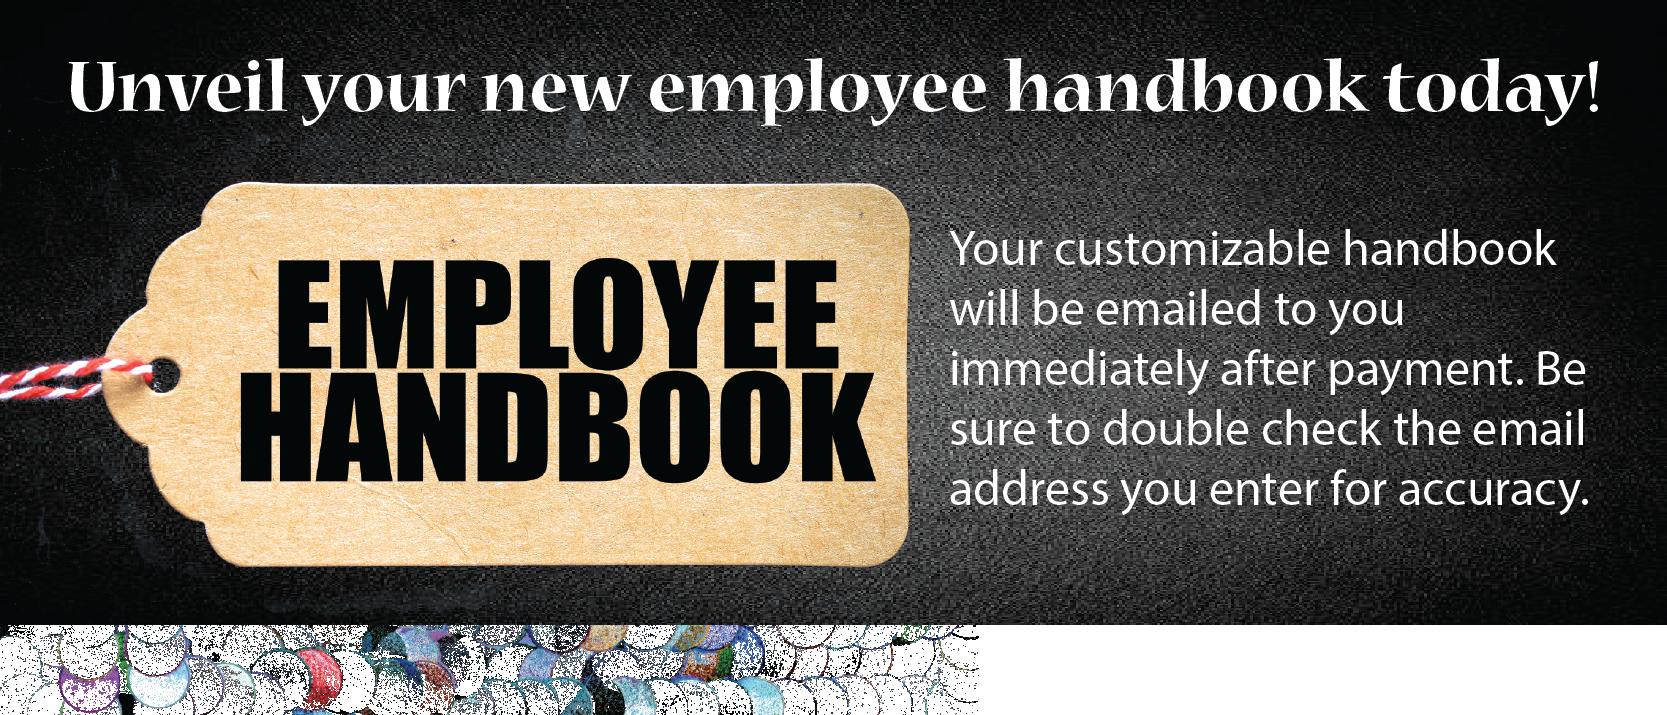 Employee Handbook download - Cardinal Services